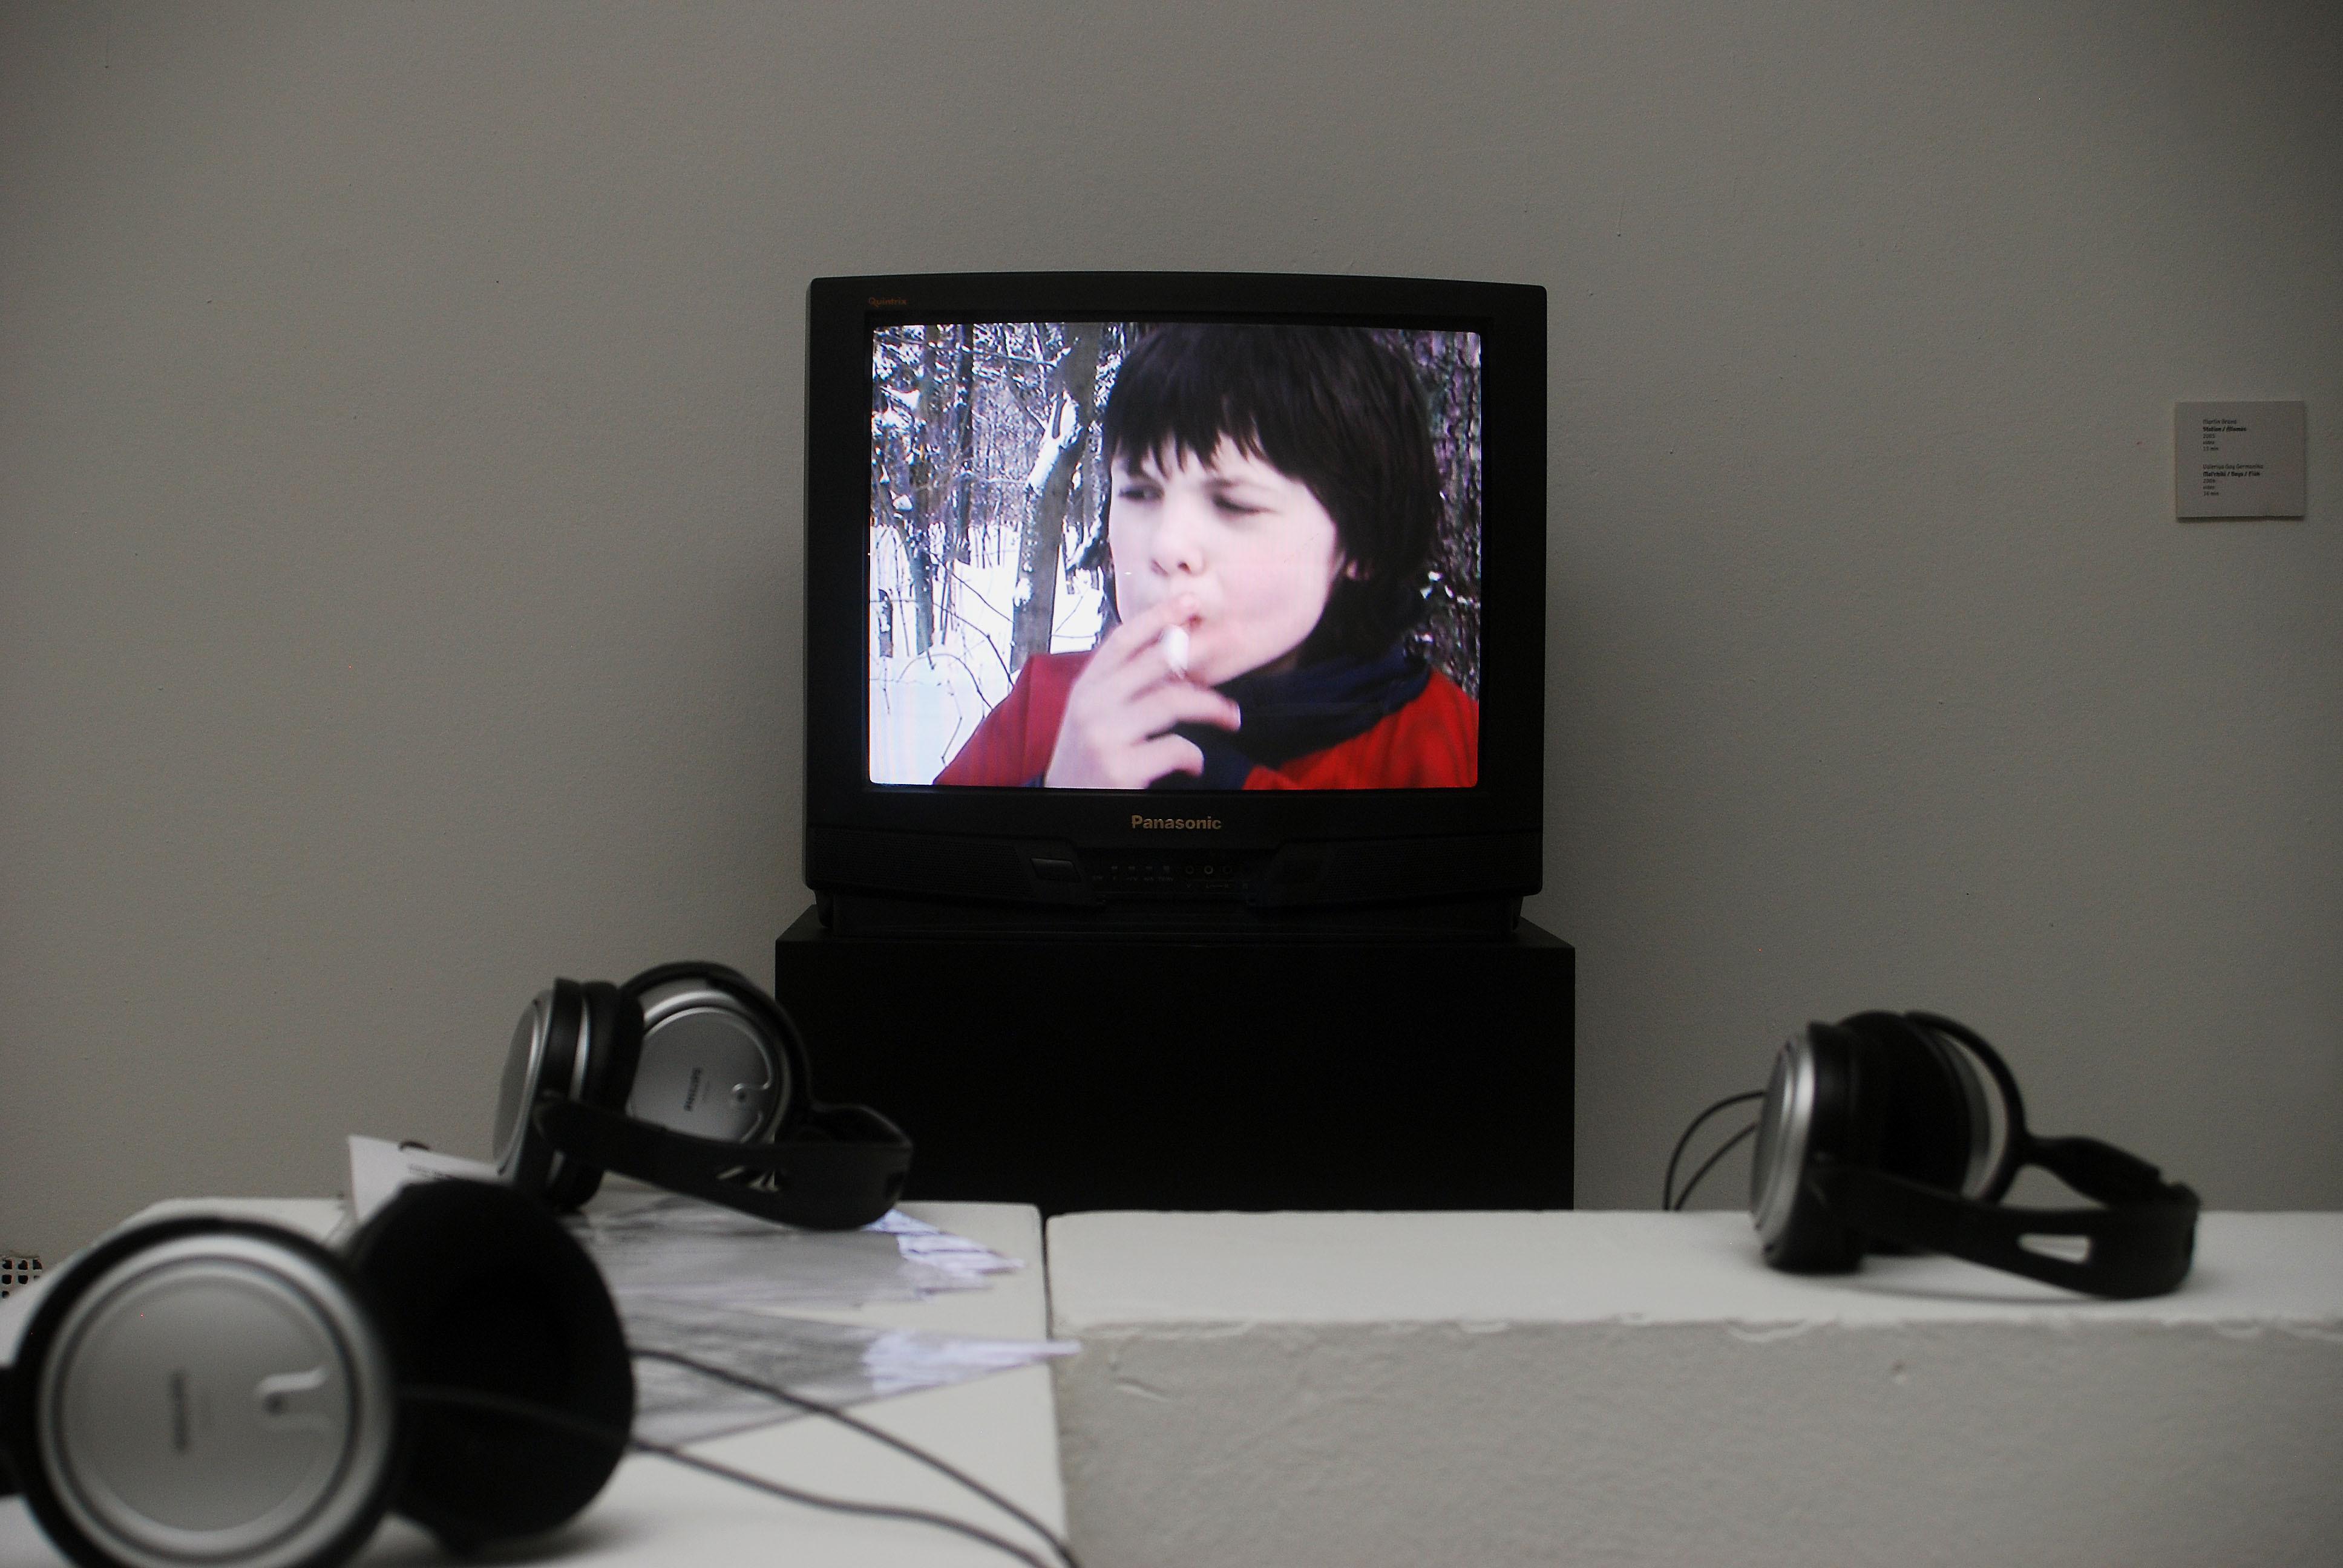 Valeriya Gay Germanika: Mal'chiki – Boys, Russia, 2006, DVD, colour, sound, 36 min | photo: Gabriella Csoszó